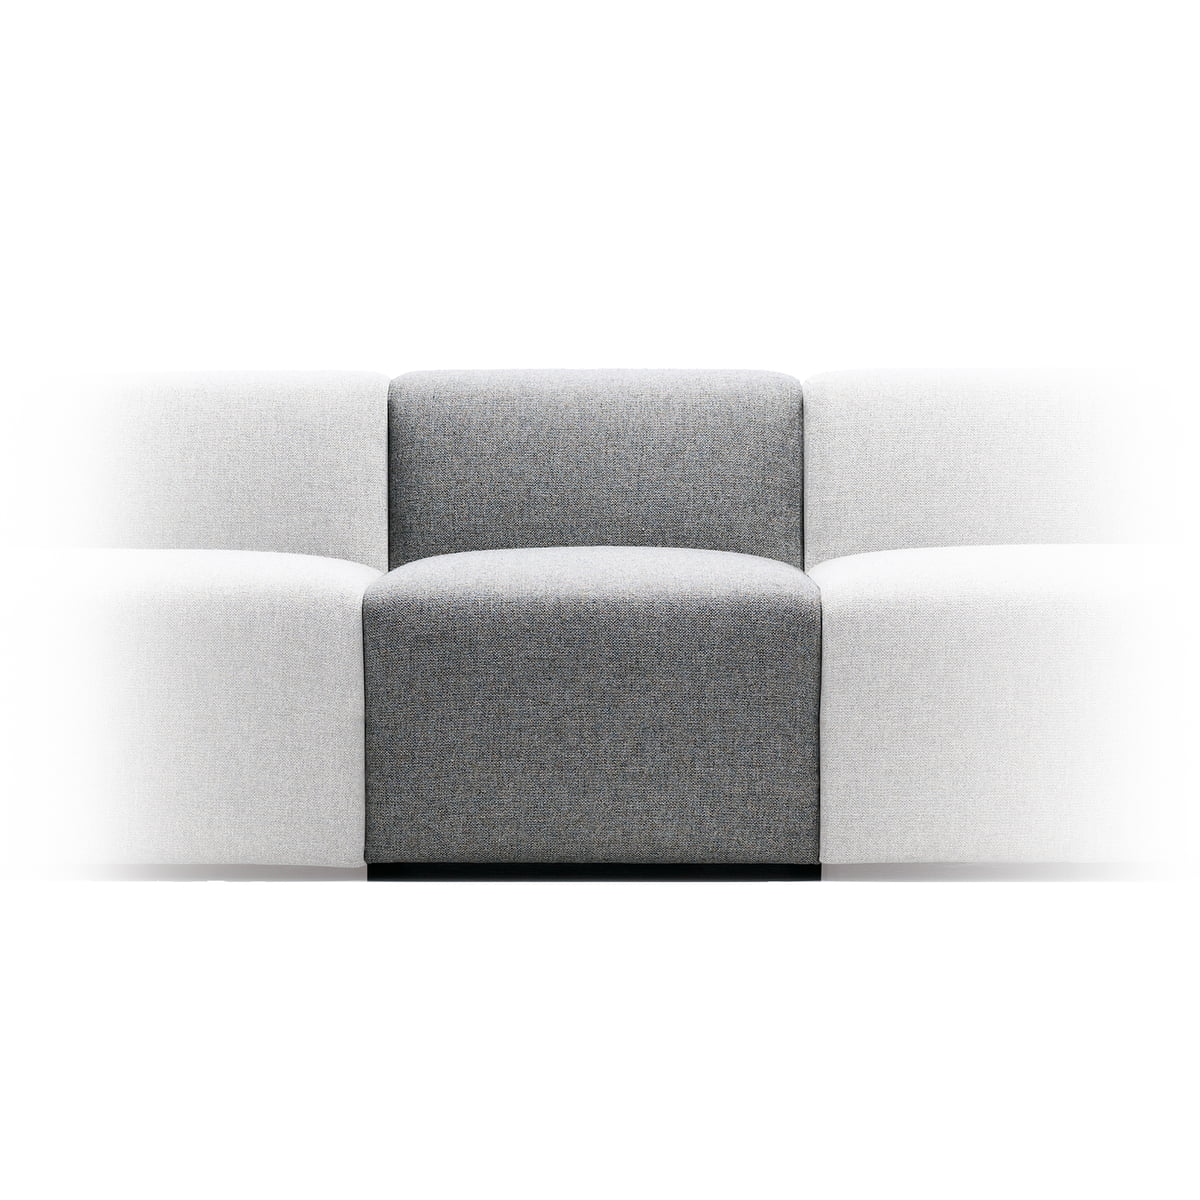 mags sofa module narrow von hay. Black Bedroom Furniture Sets. Home Design Ideas